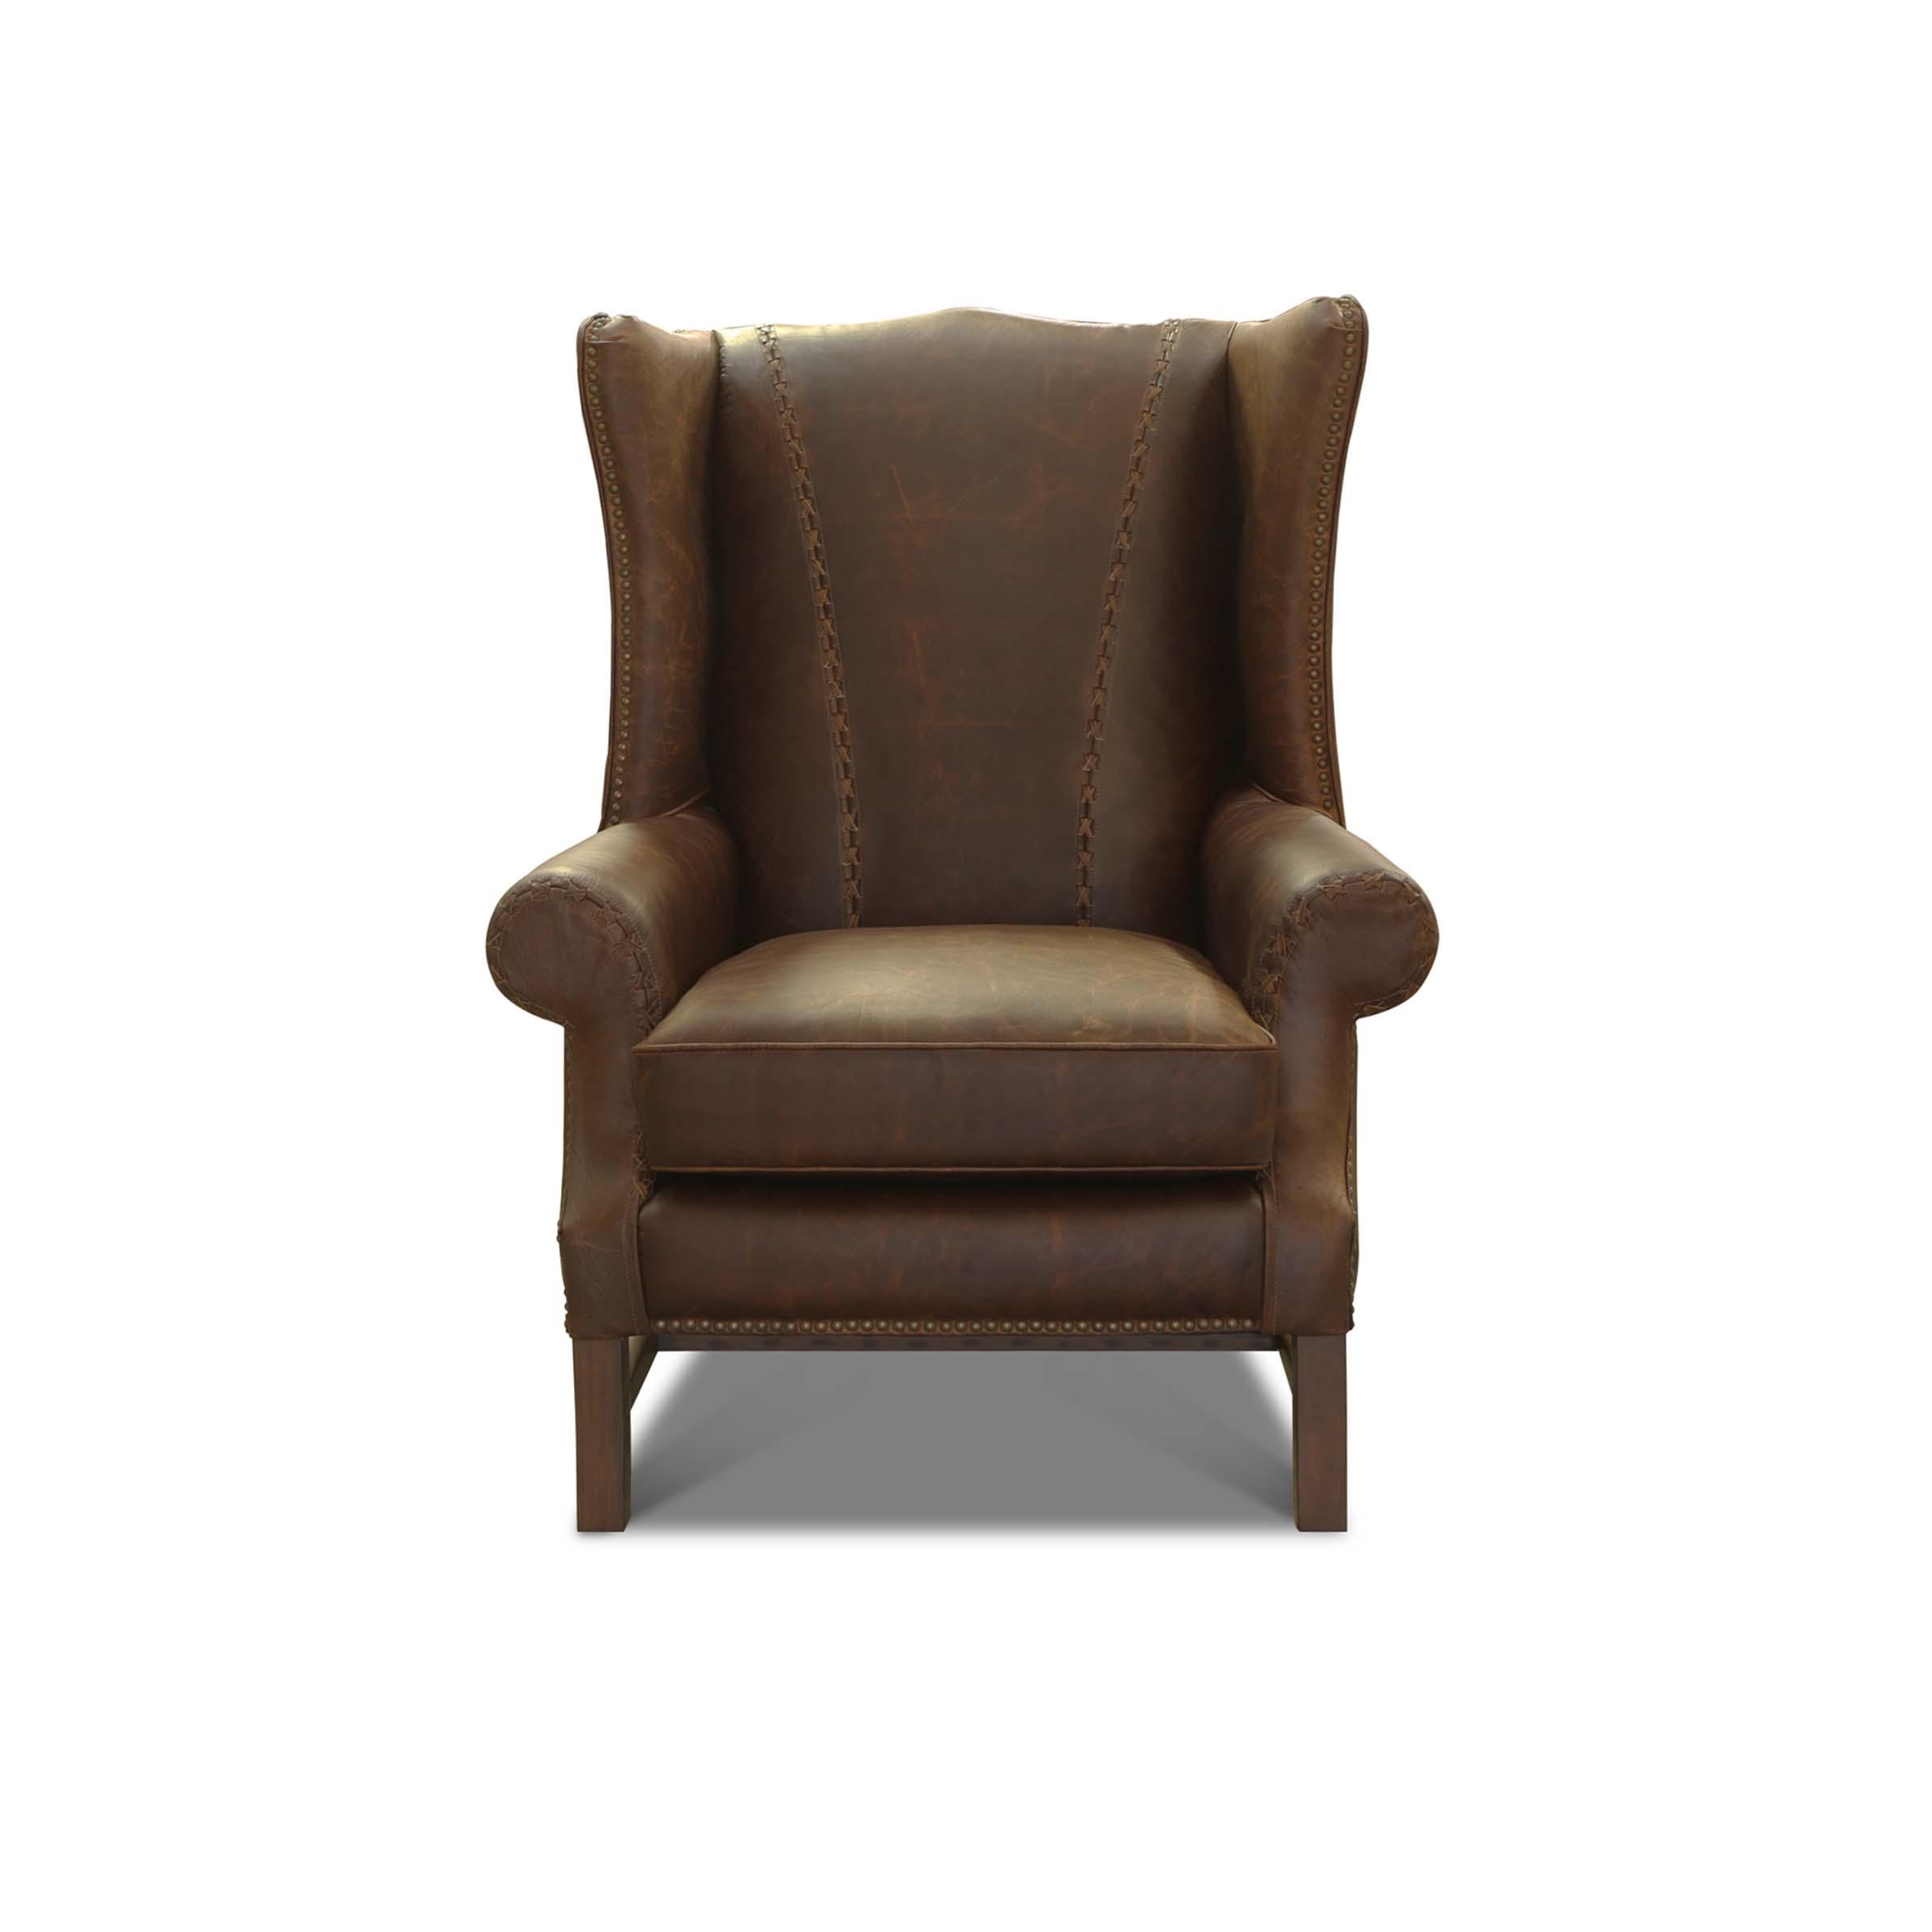 RODOLFO - 1E Accent Chair Stonewood Vanilla